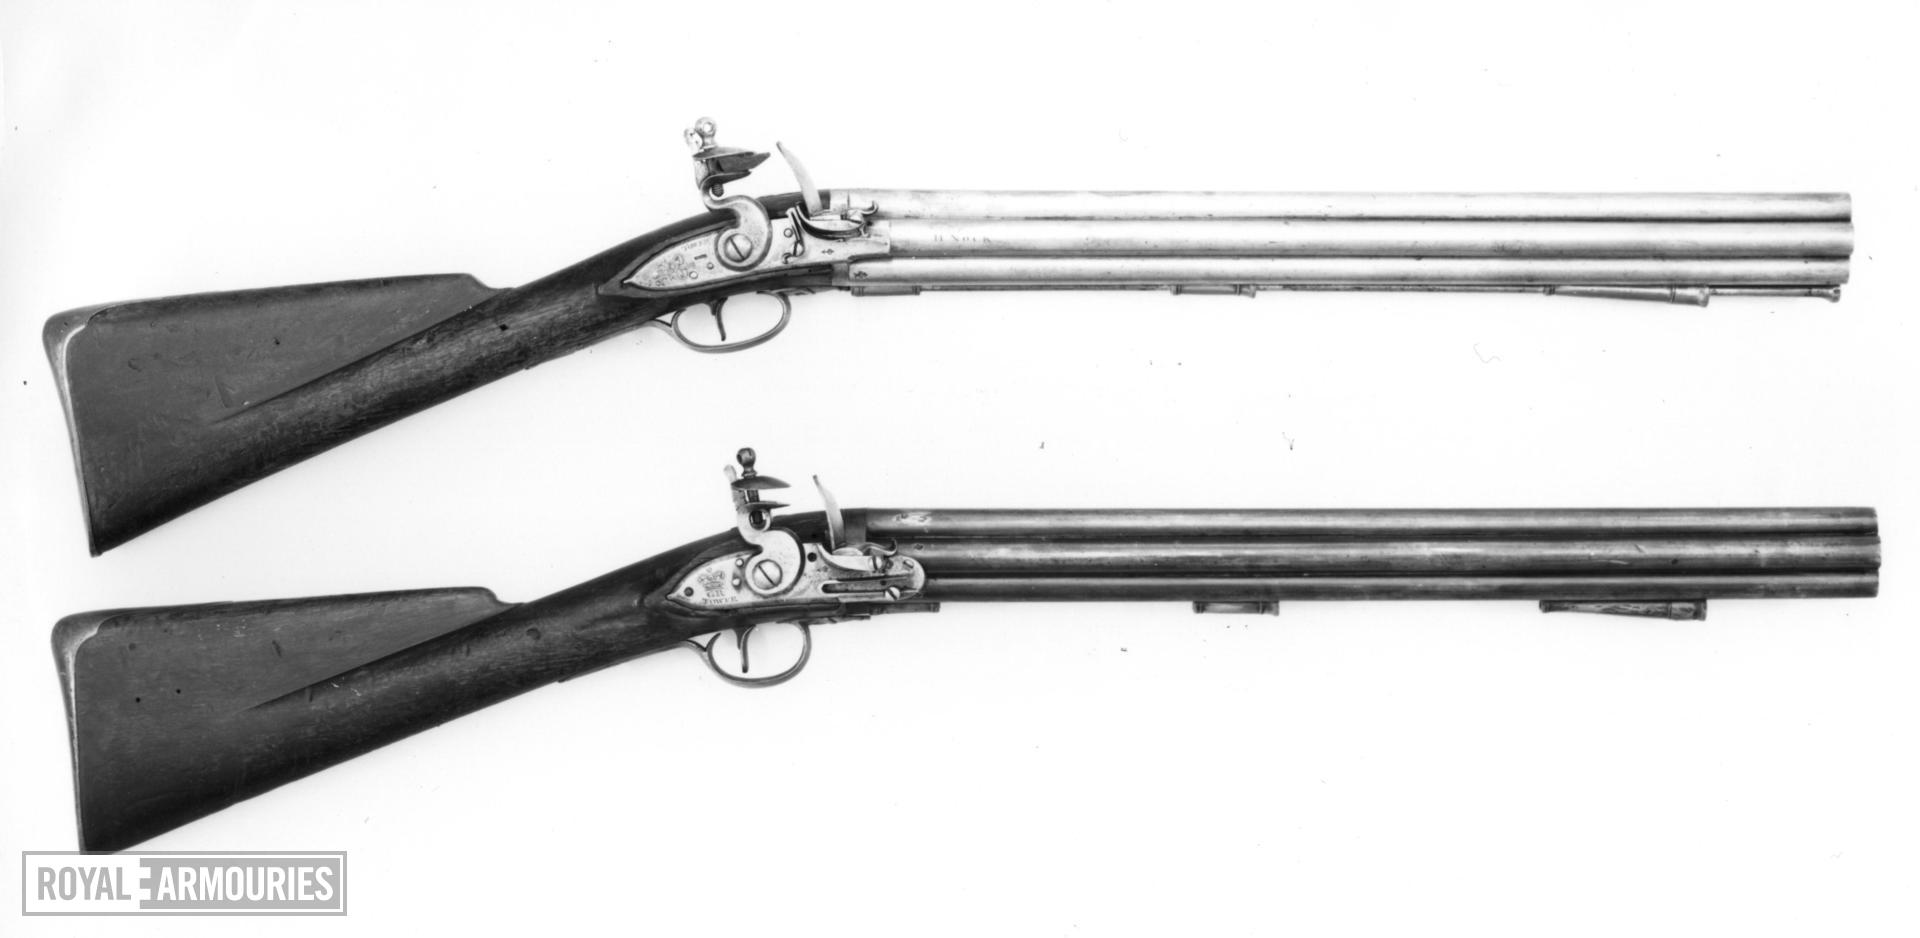 Flintlock military volley gun - Pattern 1780 Nock Volley 1st pattern By H. Nock